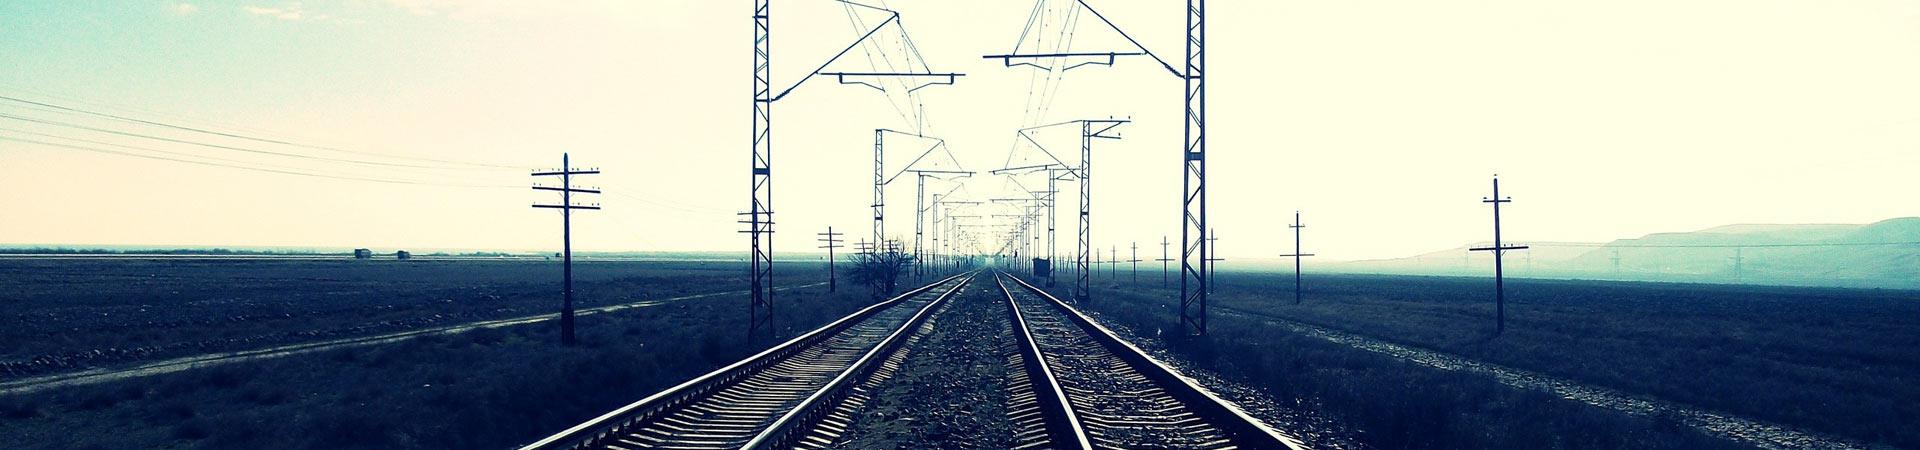 Meteora by train